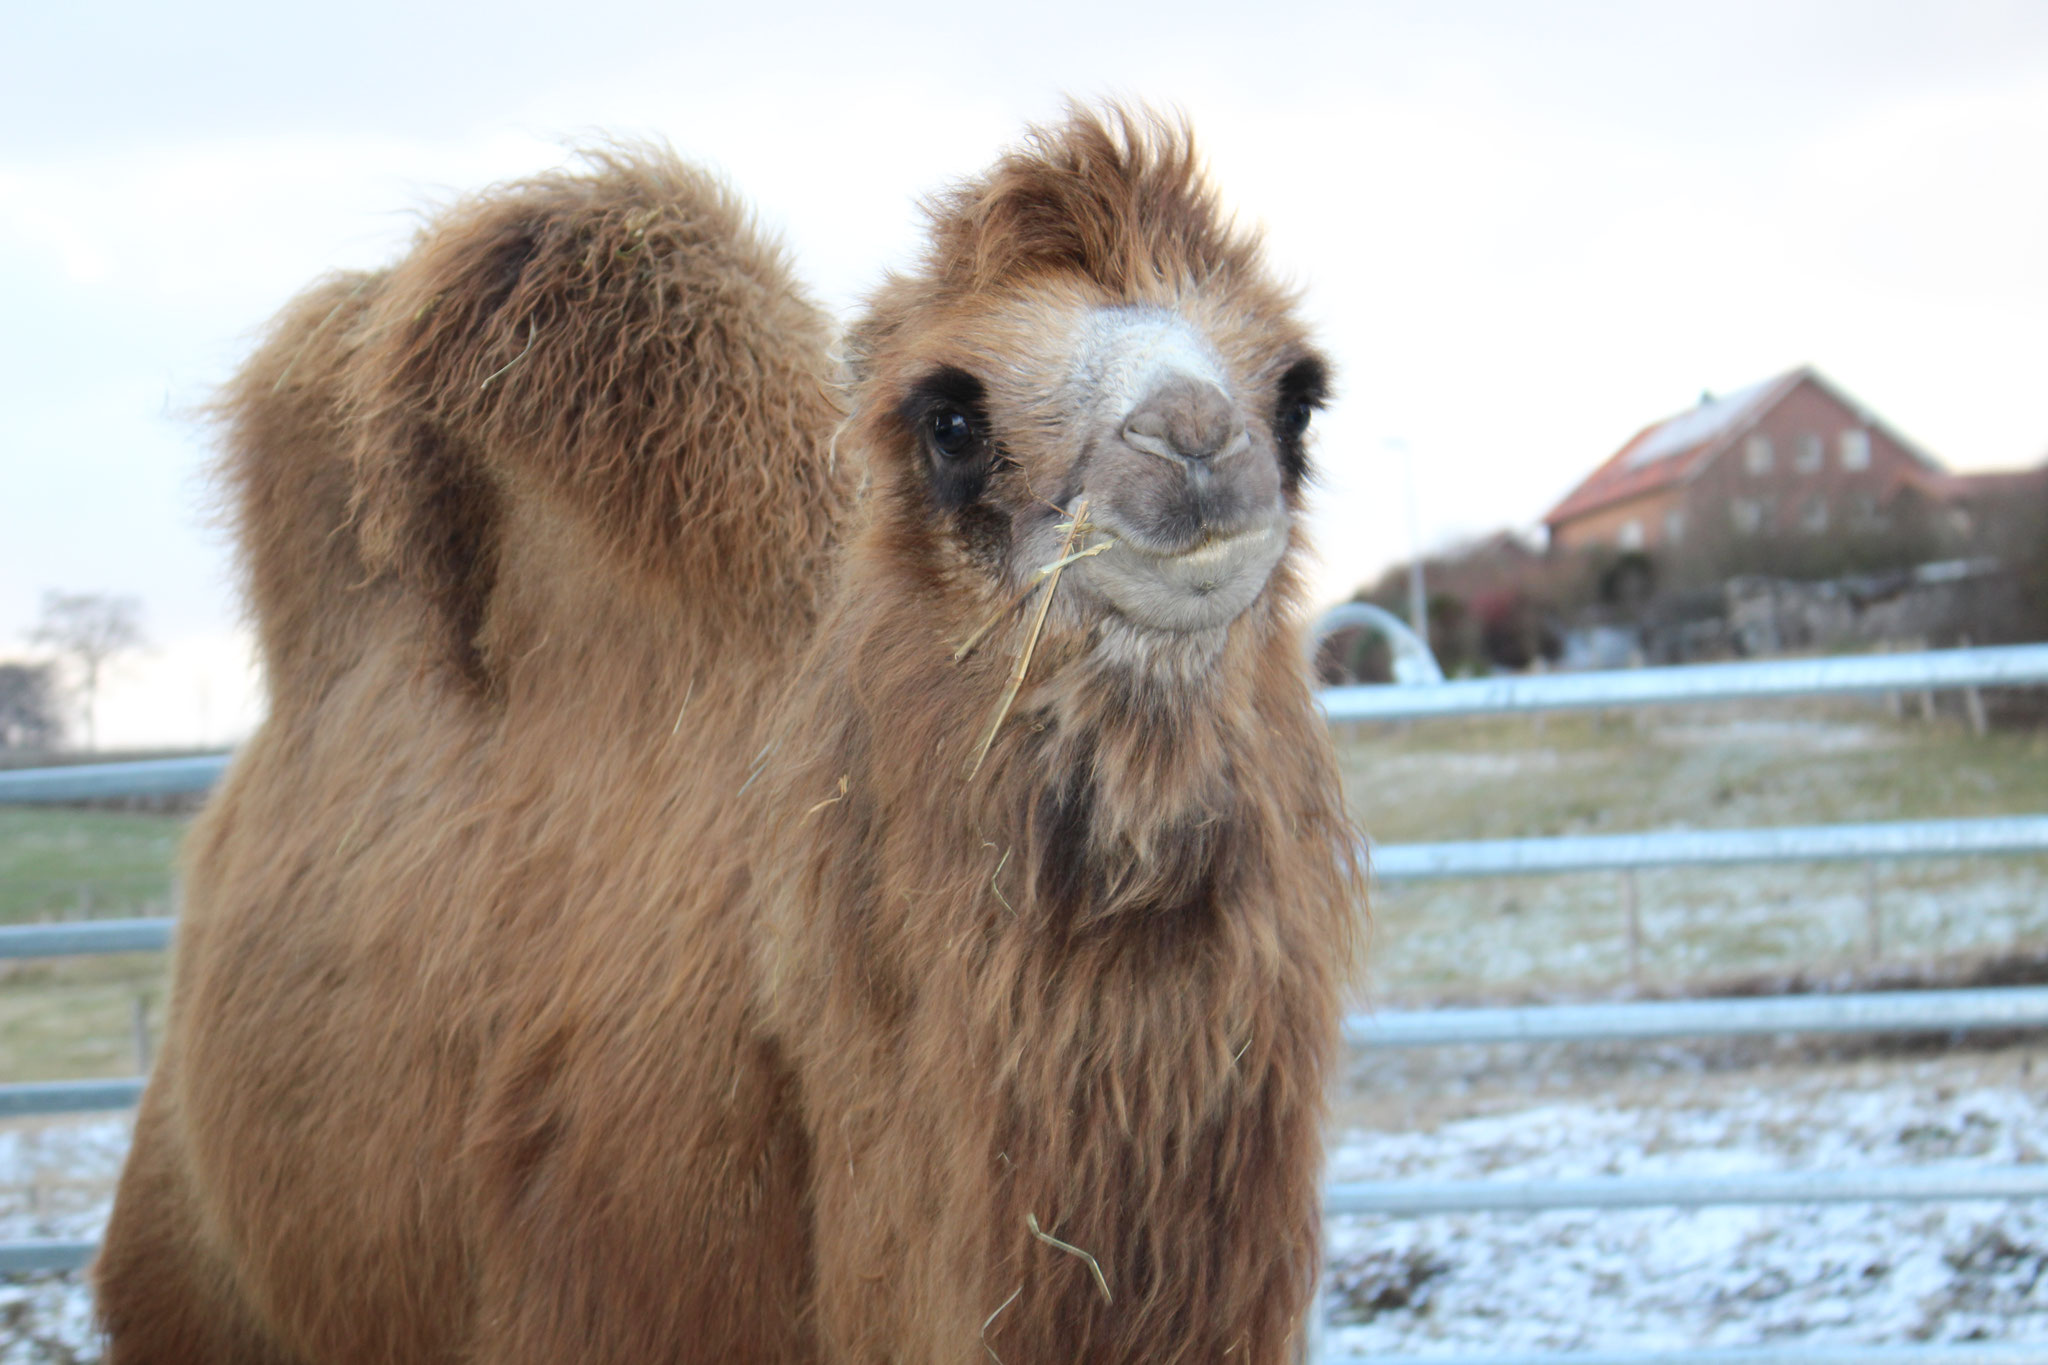 Unsere Kamele